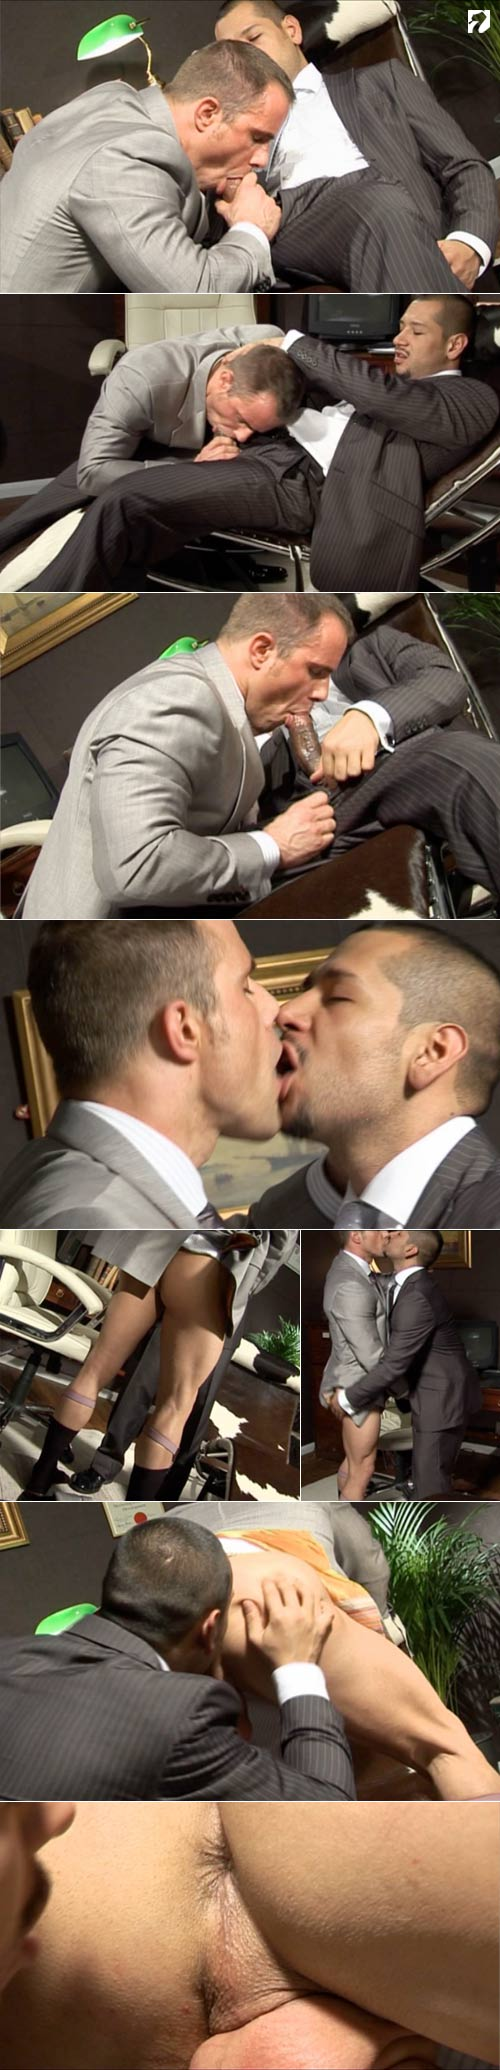 The Shrink (Starring Christian Alexander & Roberto) on MenAtPlay